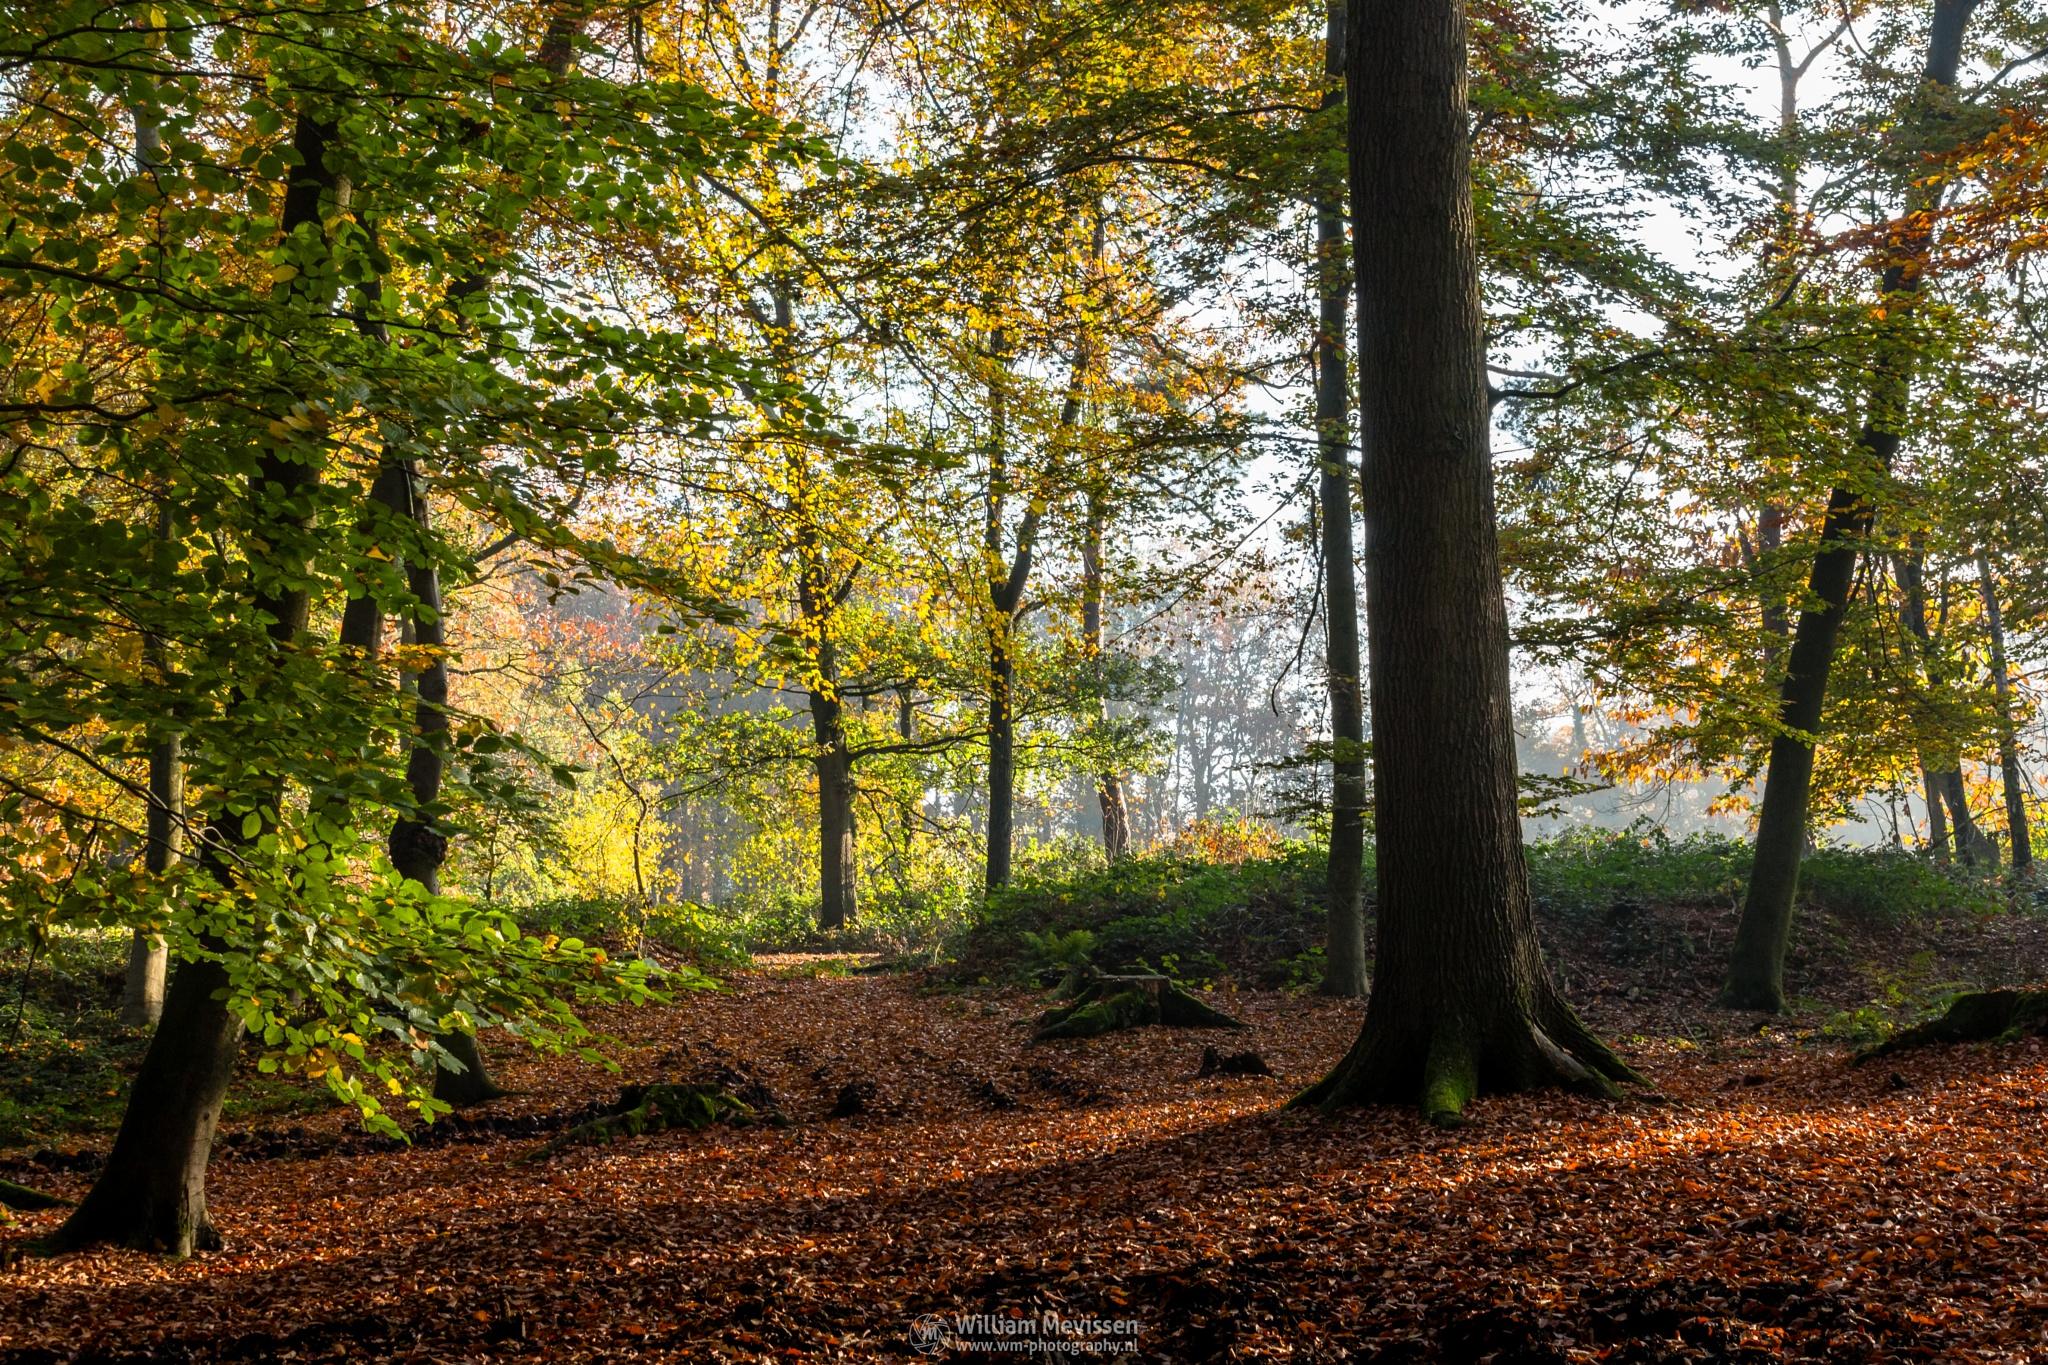 Autumn Light by William Mevissen